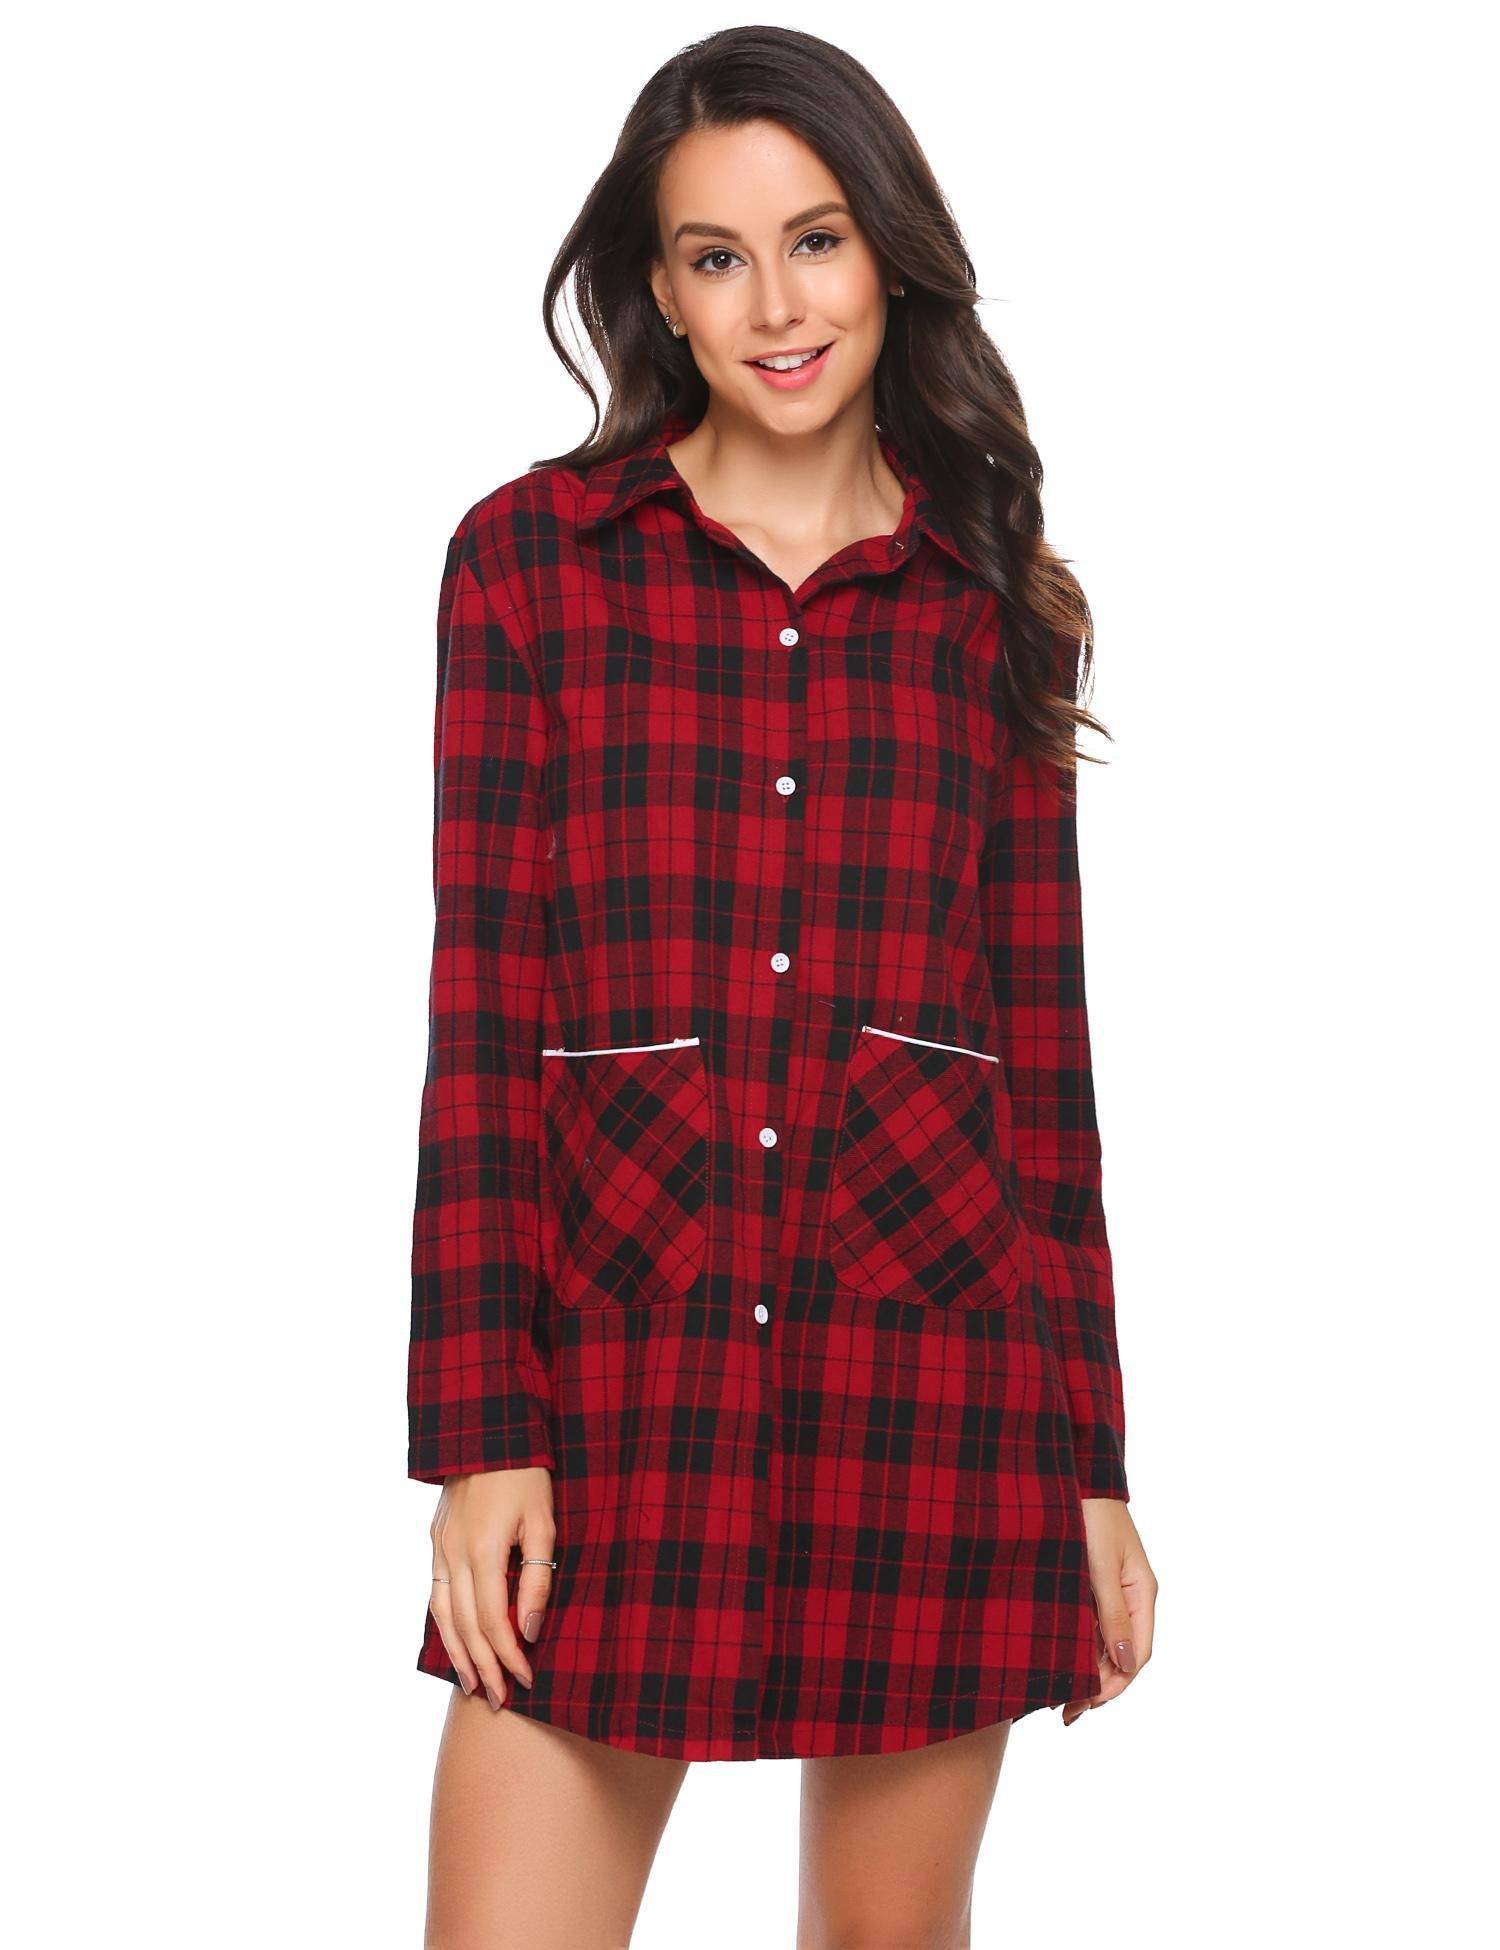 TelDen Womens Boyfriend Plaids Nightshirts Long Sleeve Cotton Pajama Tops Sleep Shirt, Red